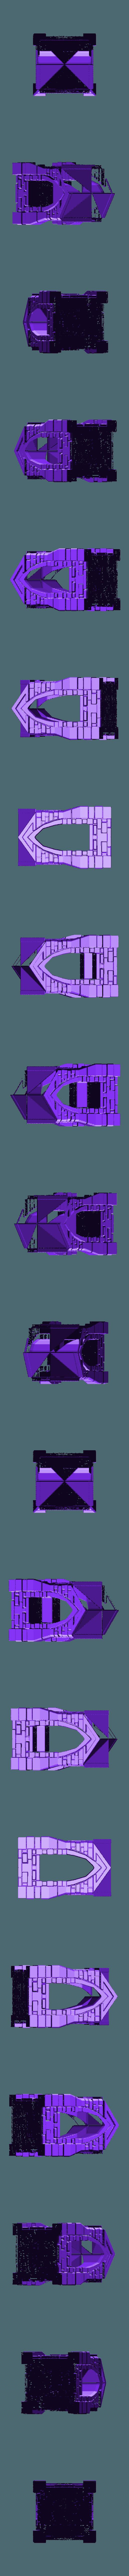 shrine2.stl Download free STL file 28mm Shrine • 3D printable template, Wrecker